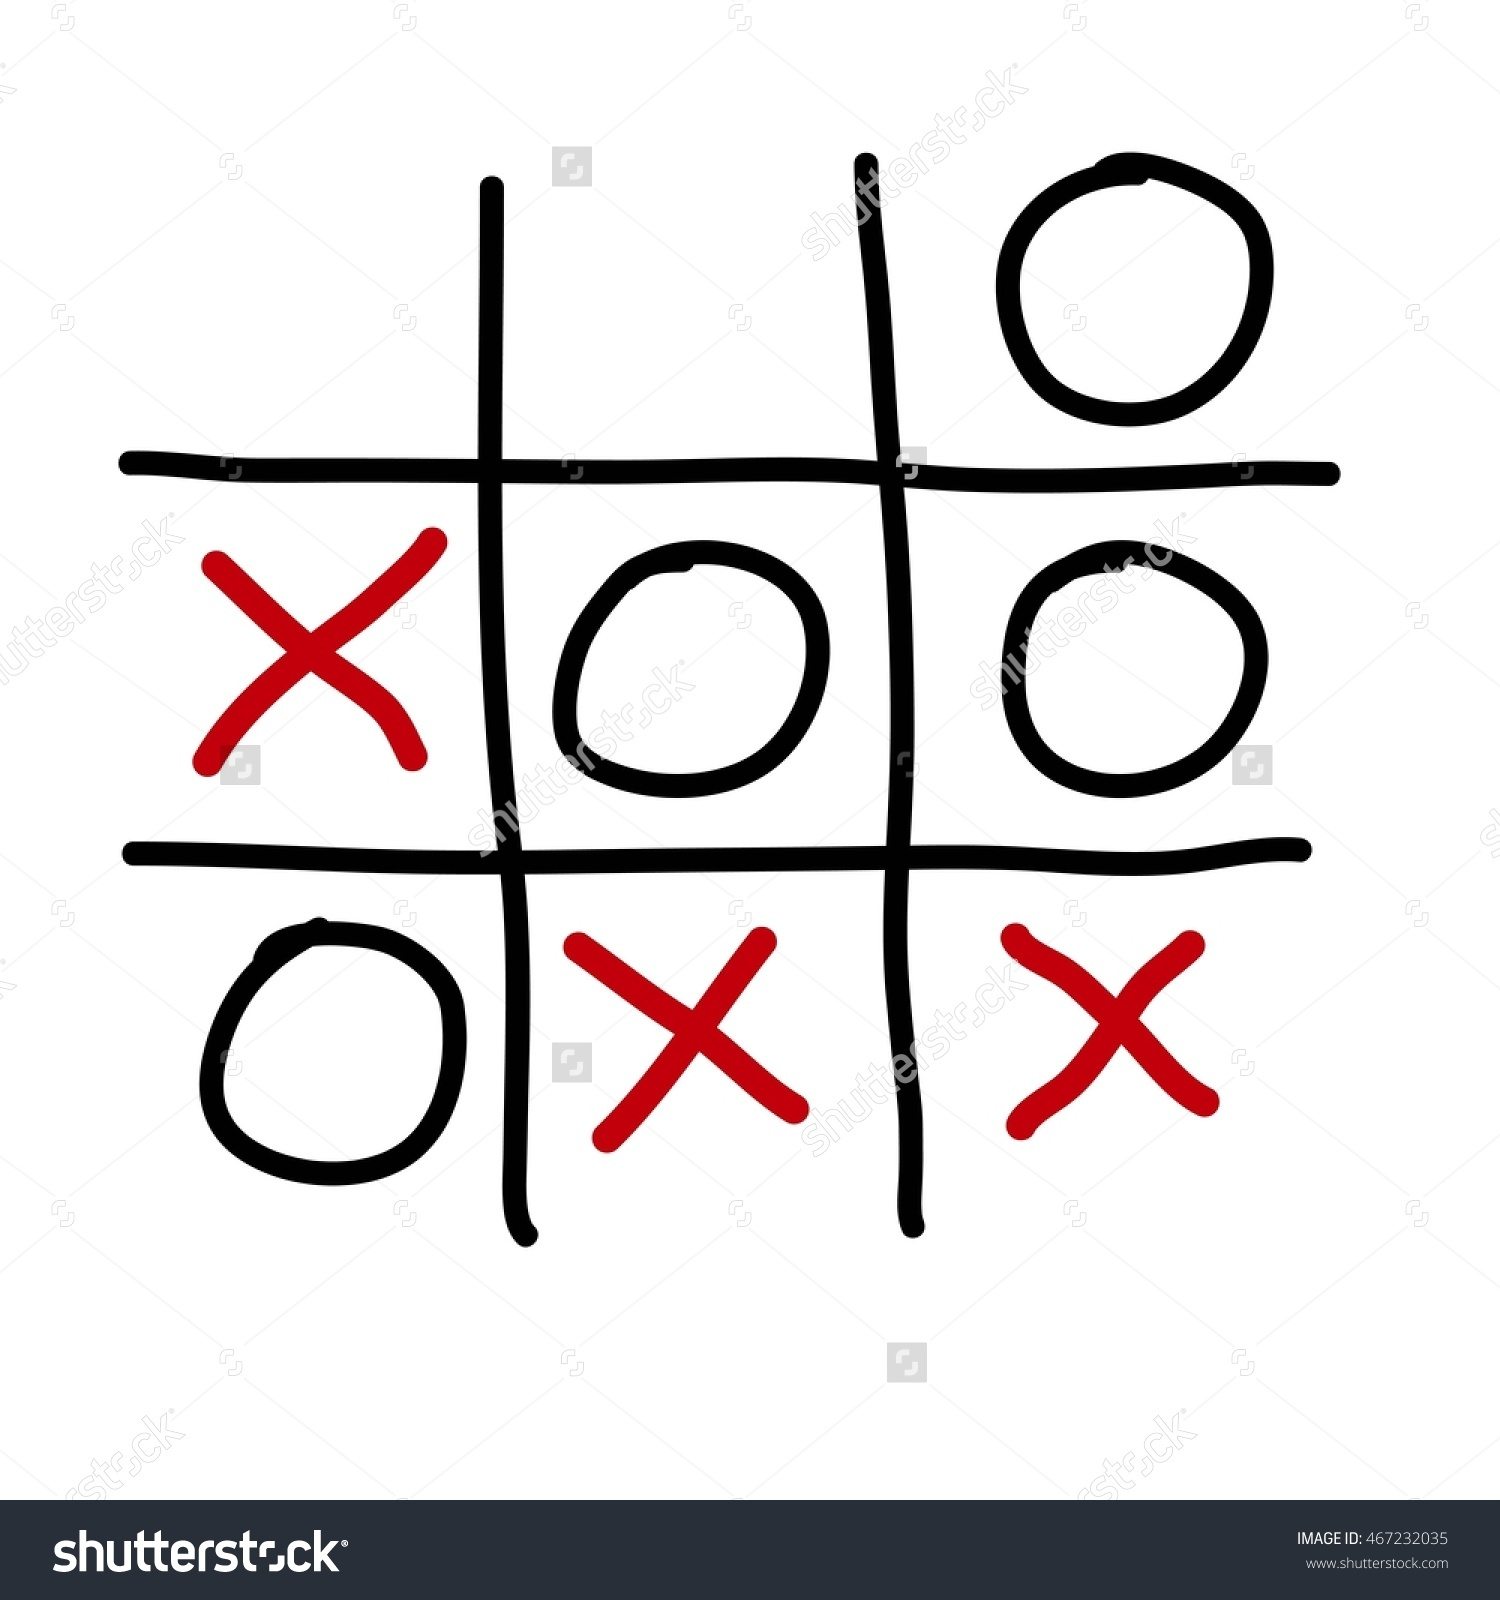 Tic Tac Toe Xo Game On Stock Illustration 467232035.